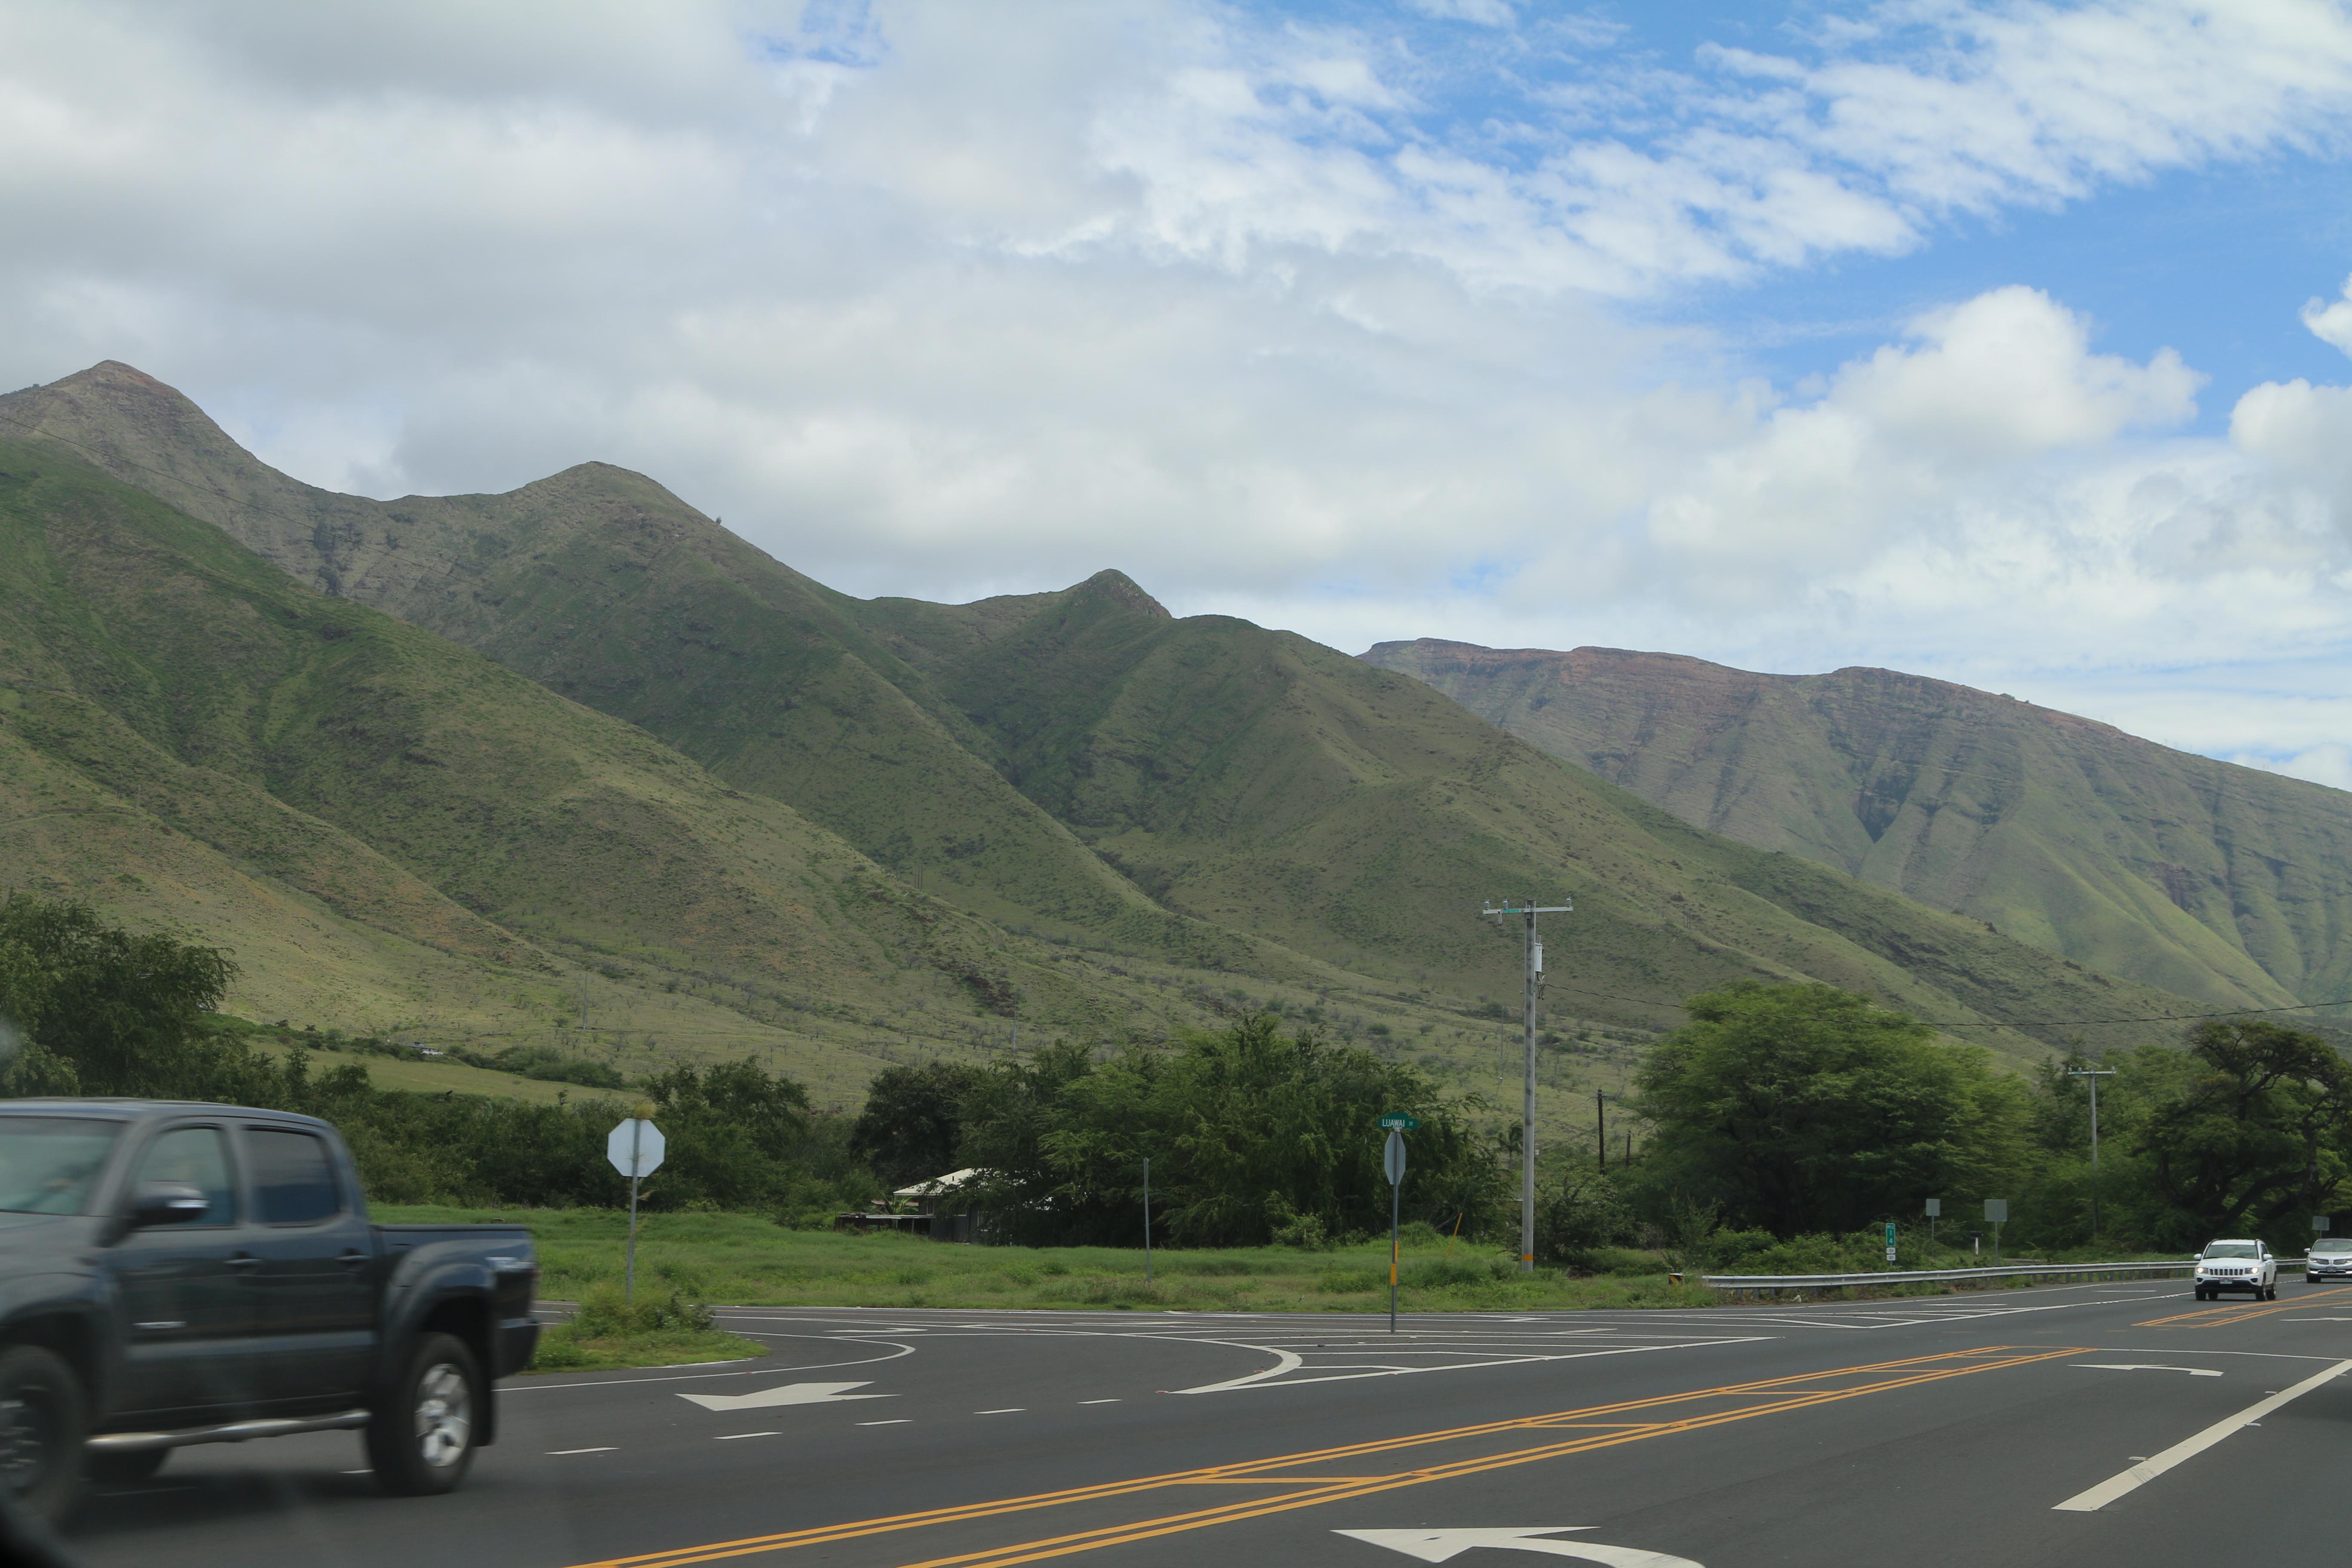 250 Attend West Maui Community Plan Workshops